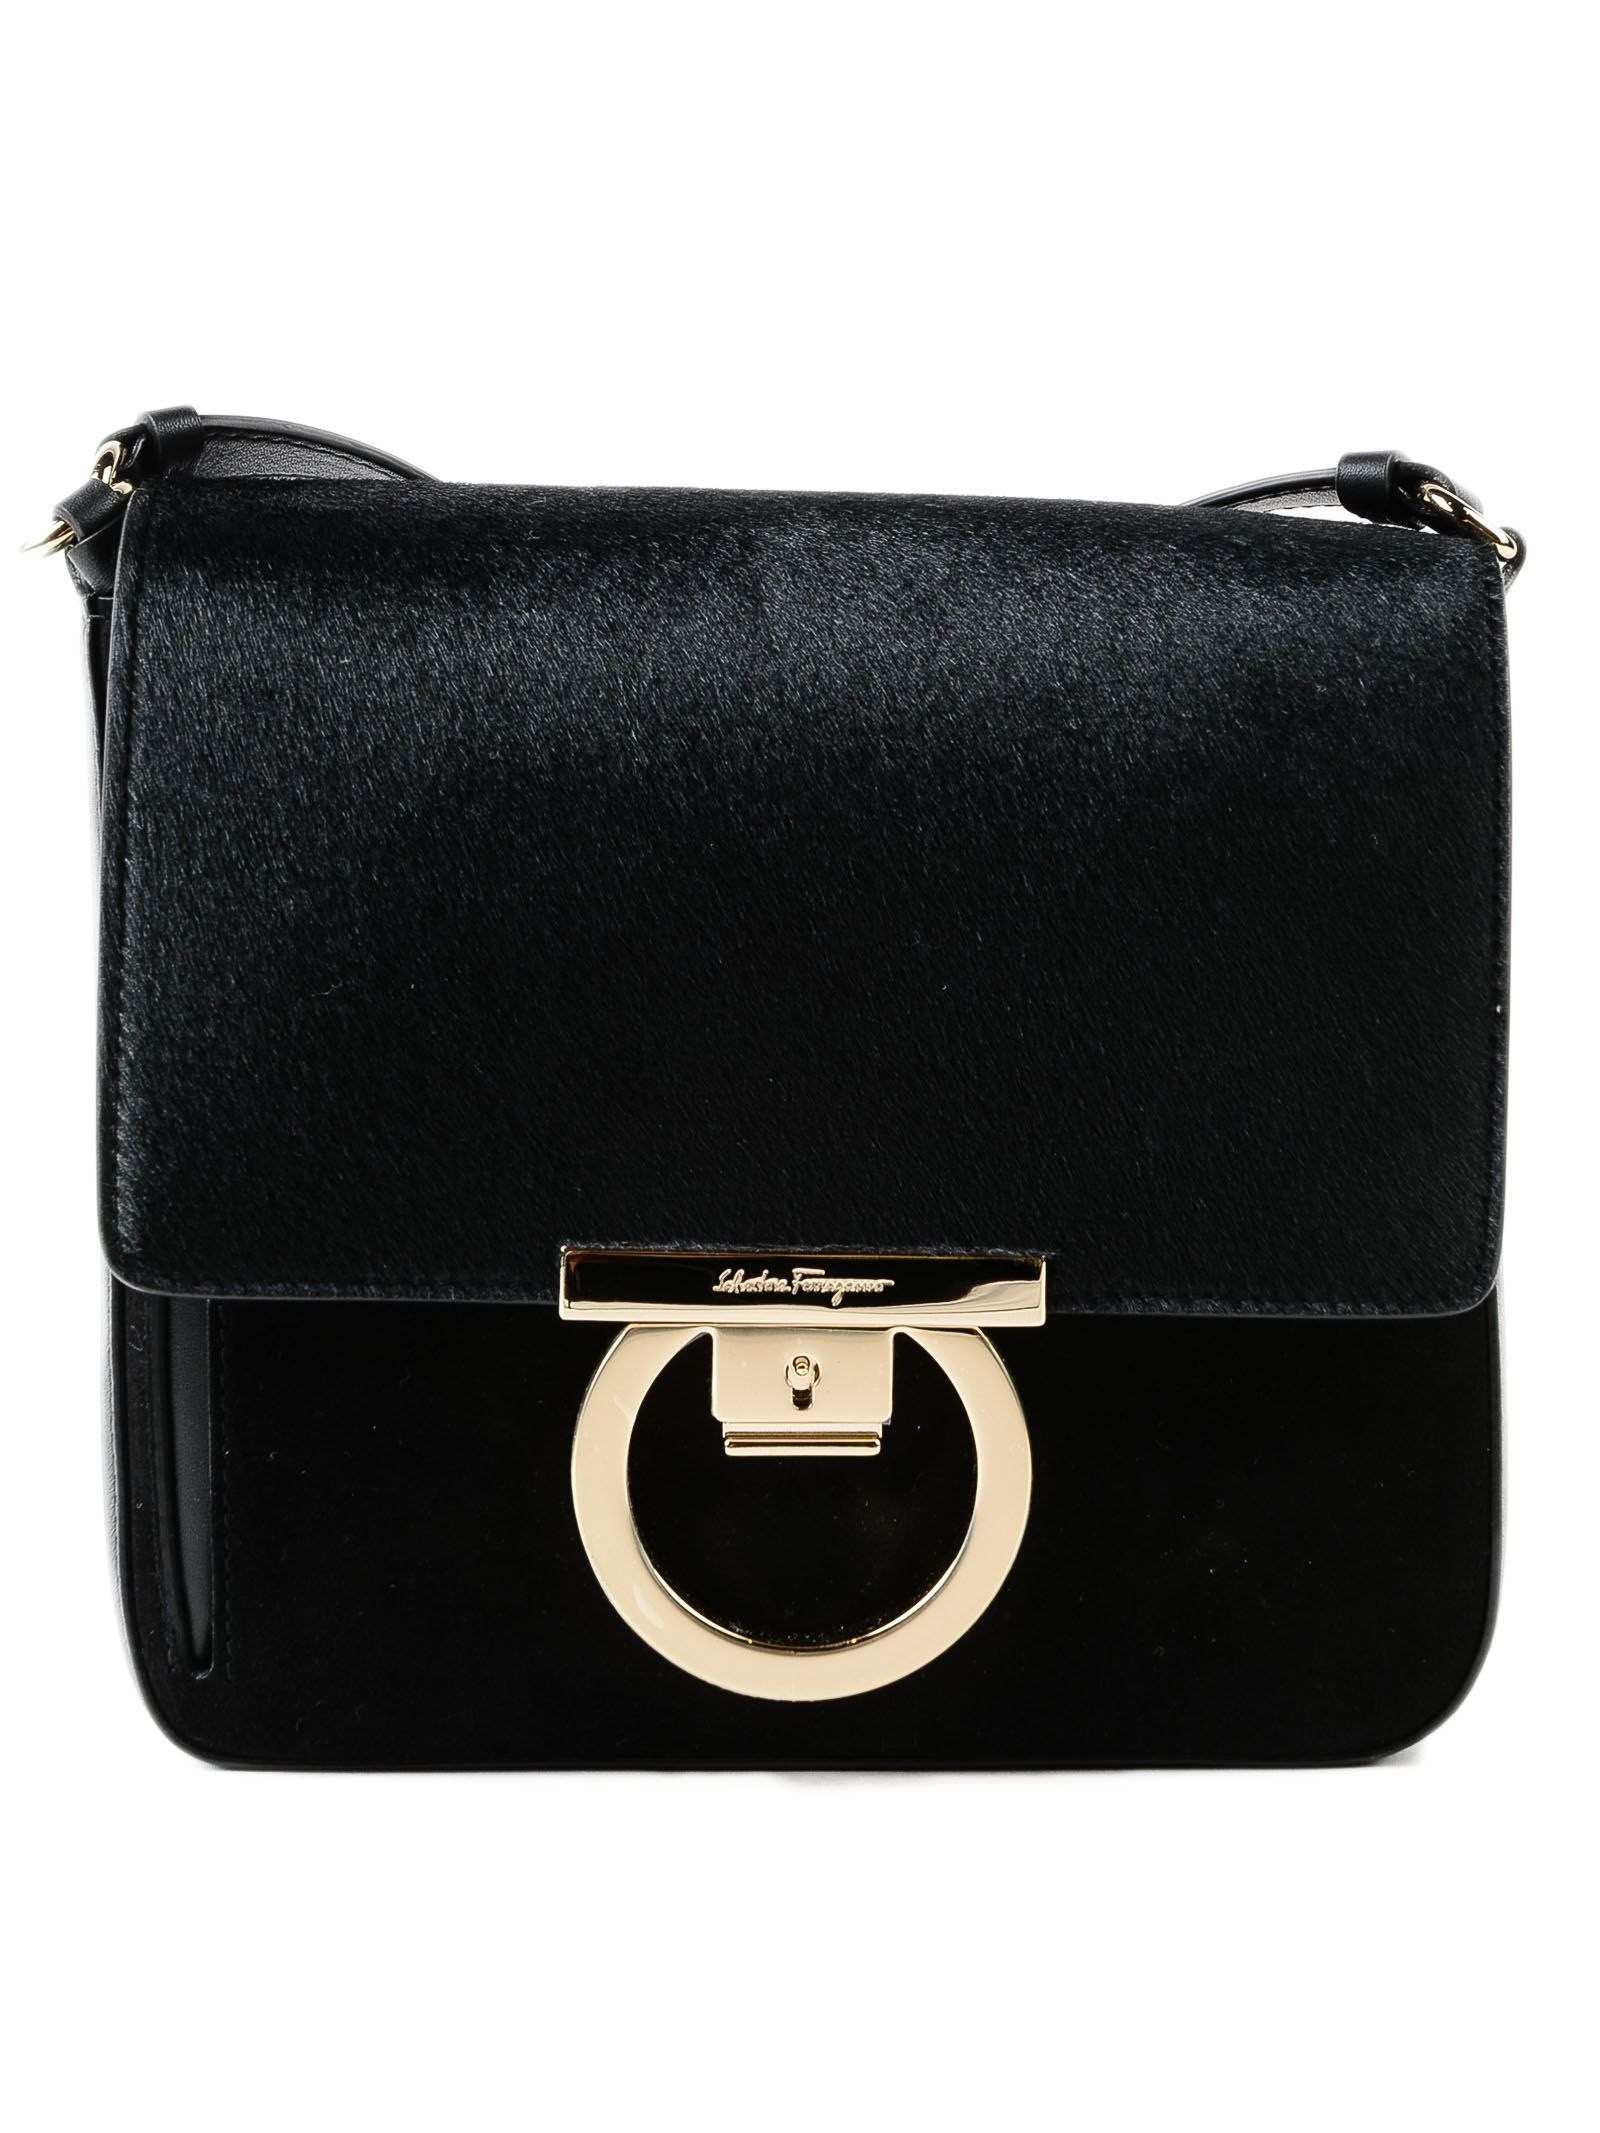 Salvatore Ferragamo Lock Shoulder Bag